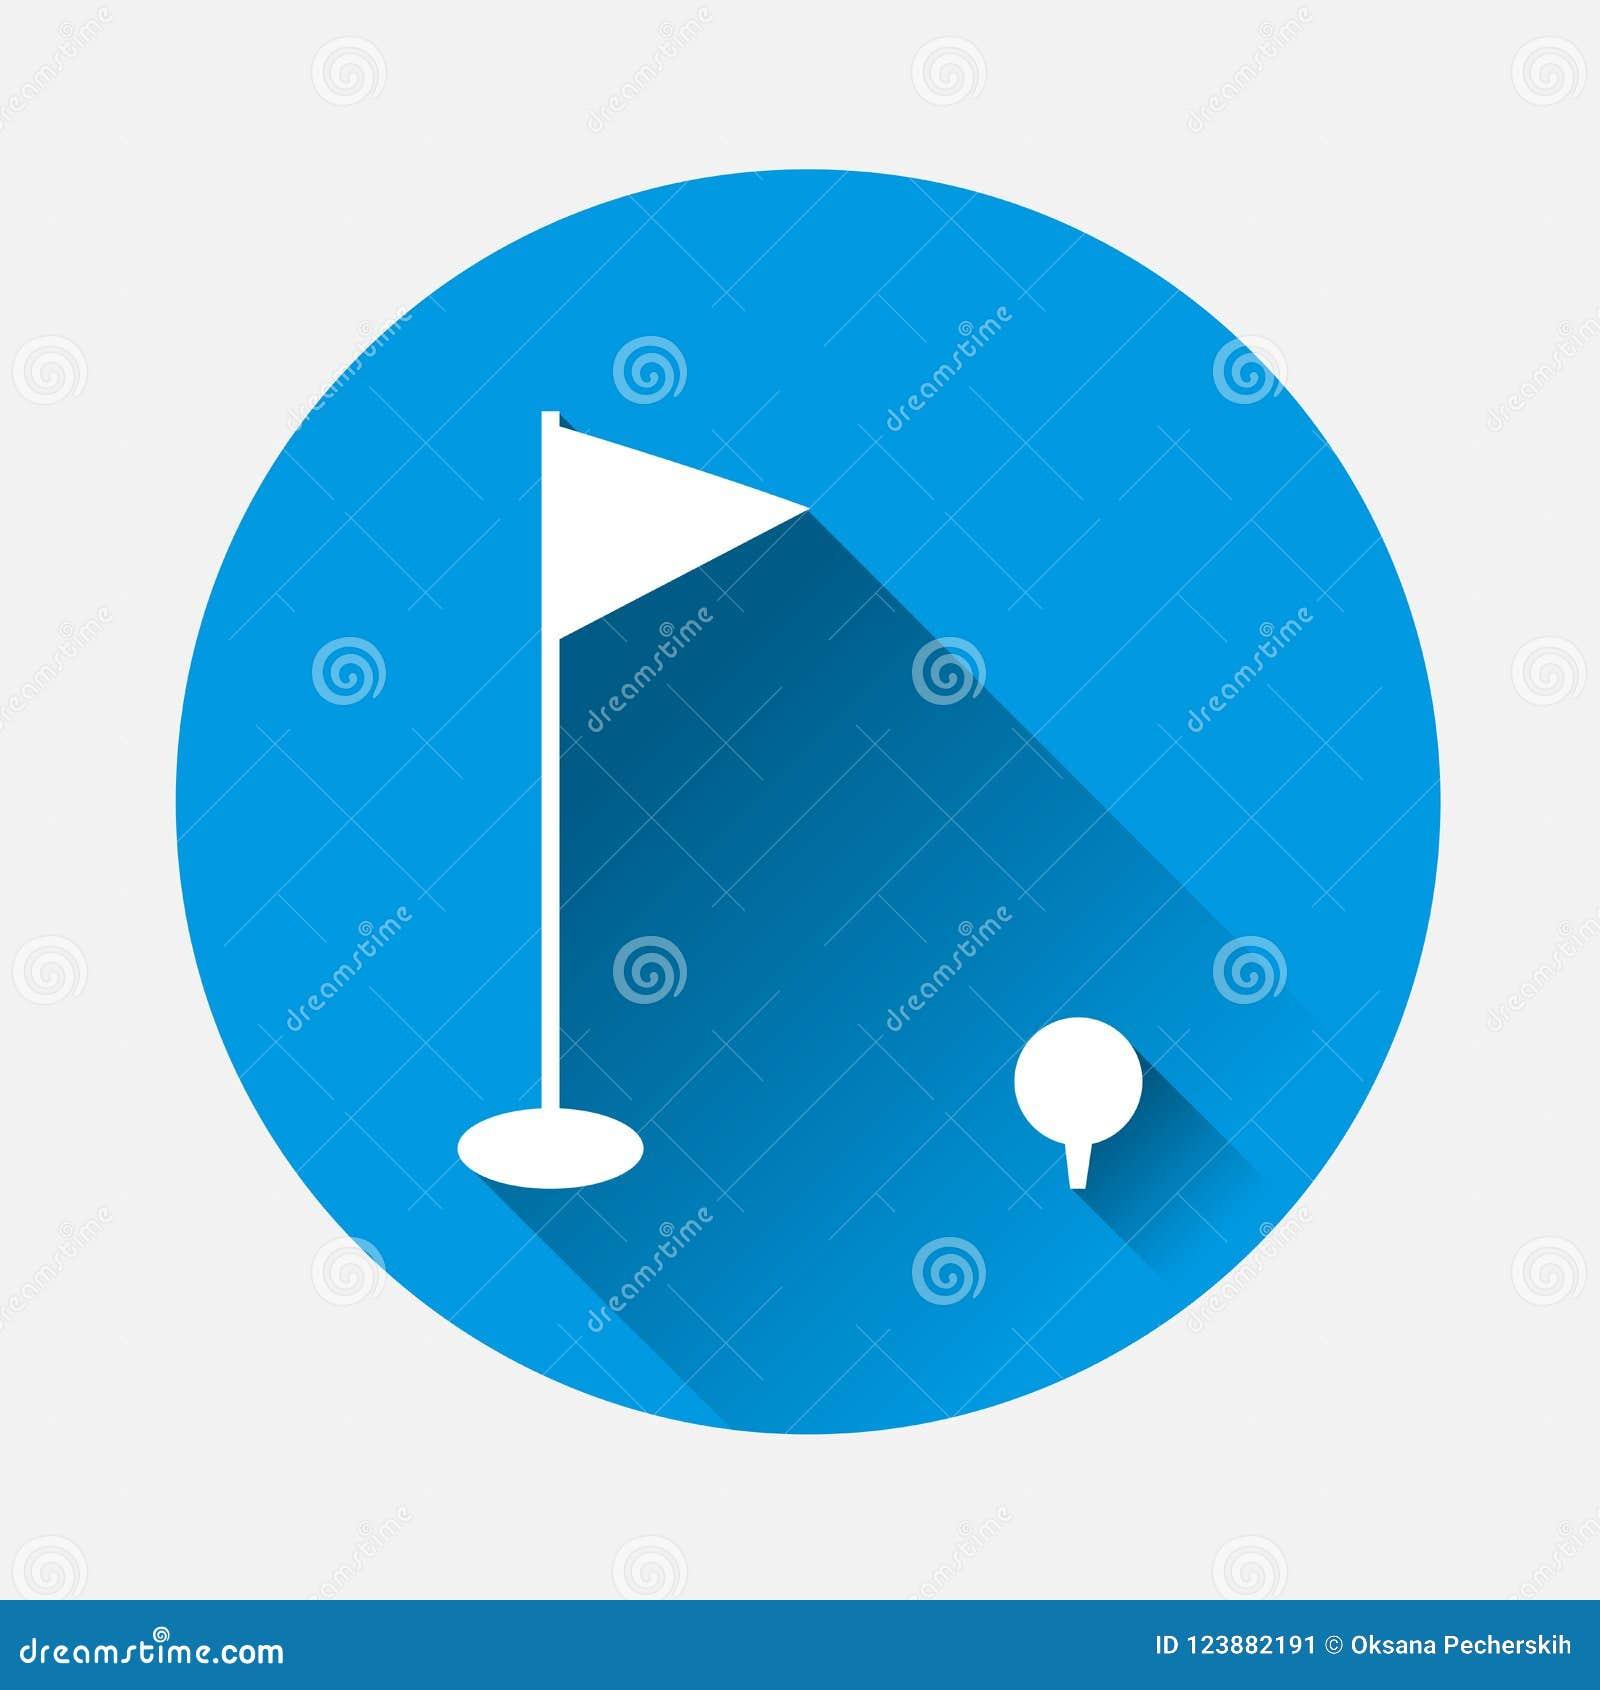 Golf Vector Image Sports Symbol On Blue Background Flat Image